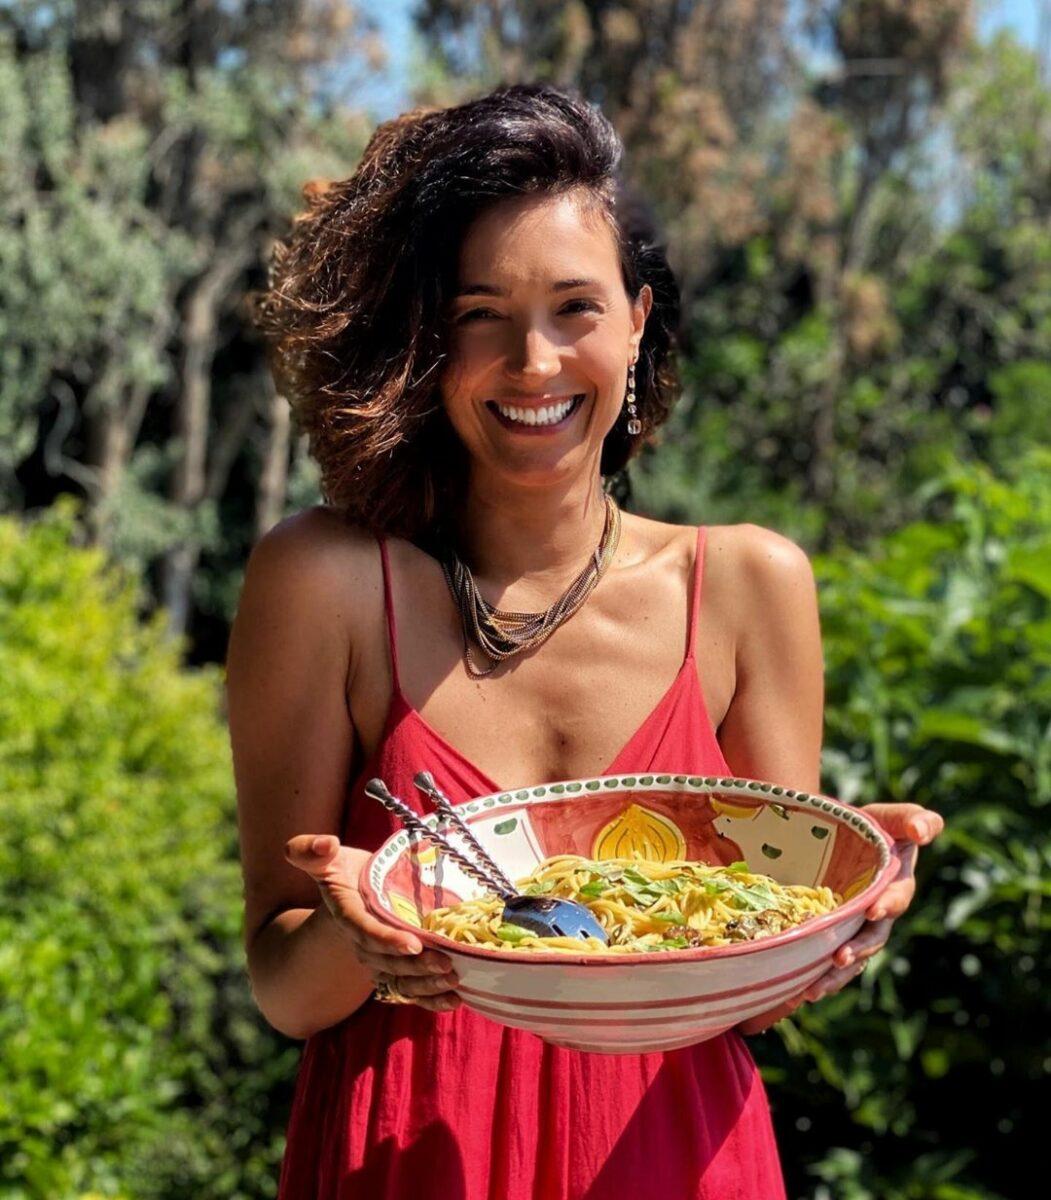 Caterina Balivo spaghetti IMG-20200702-103104